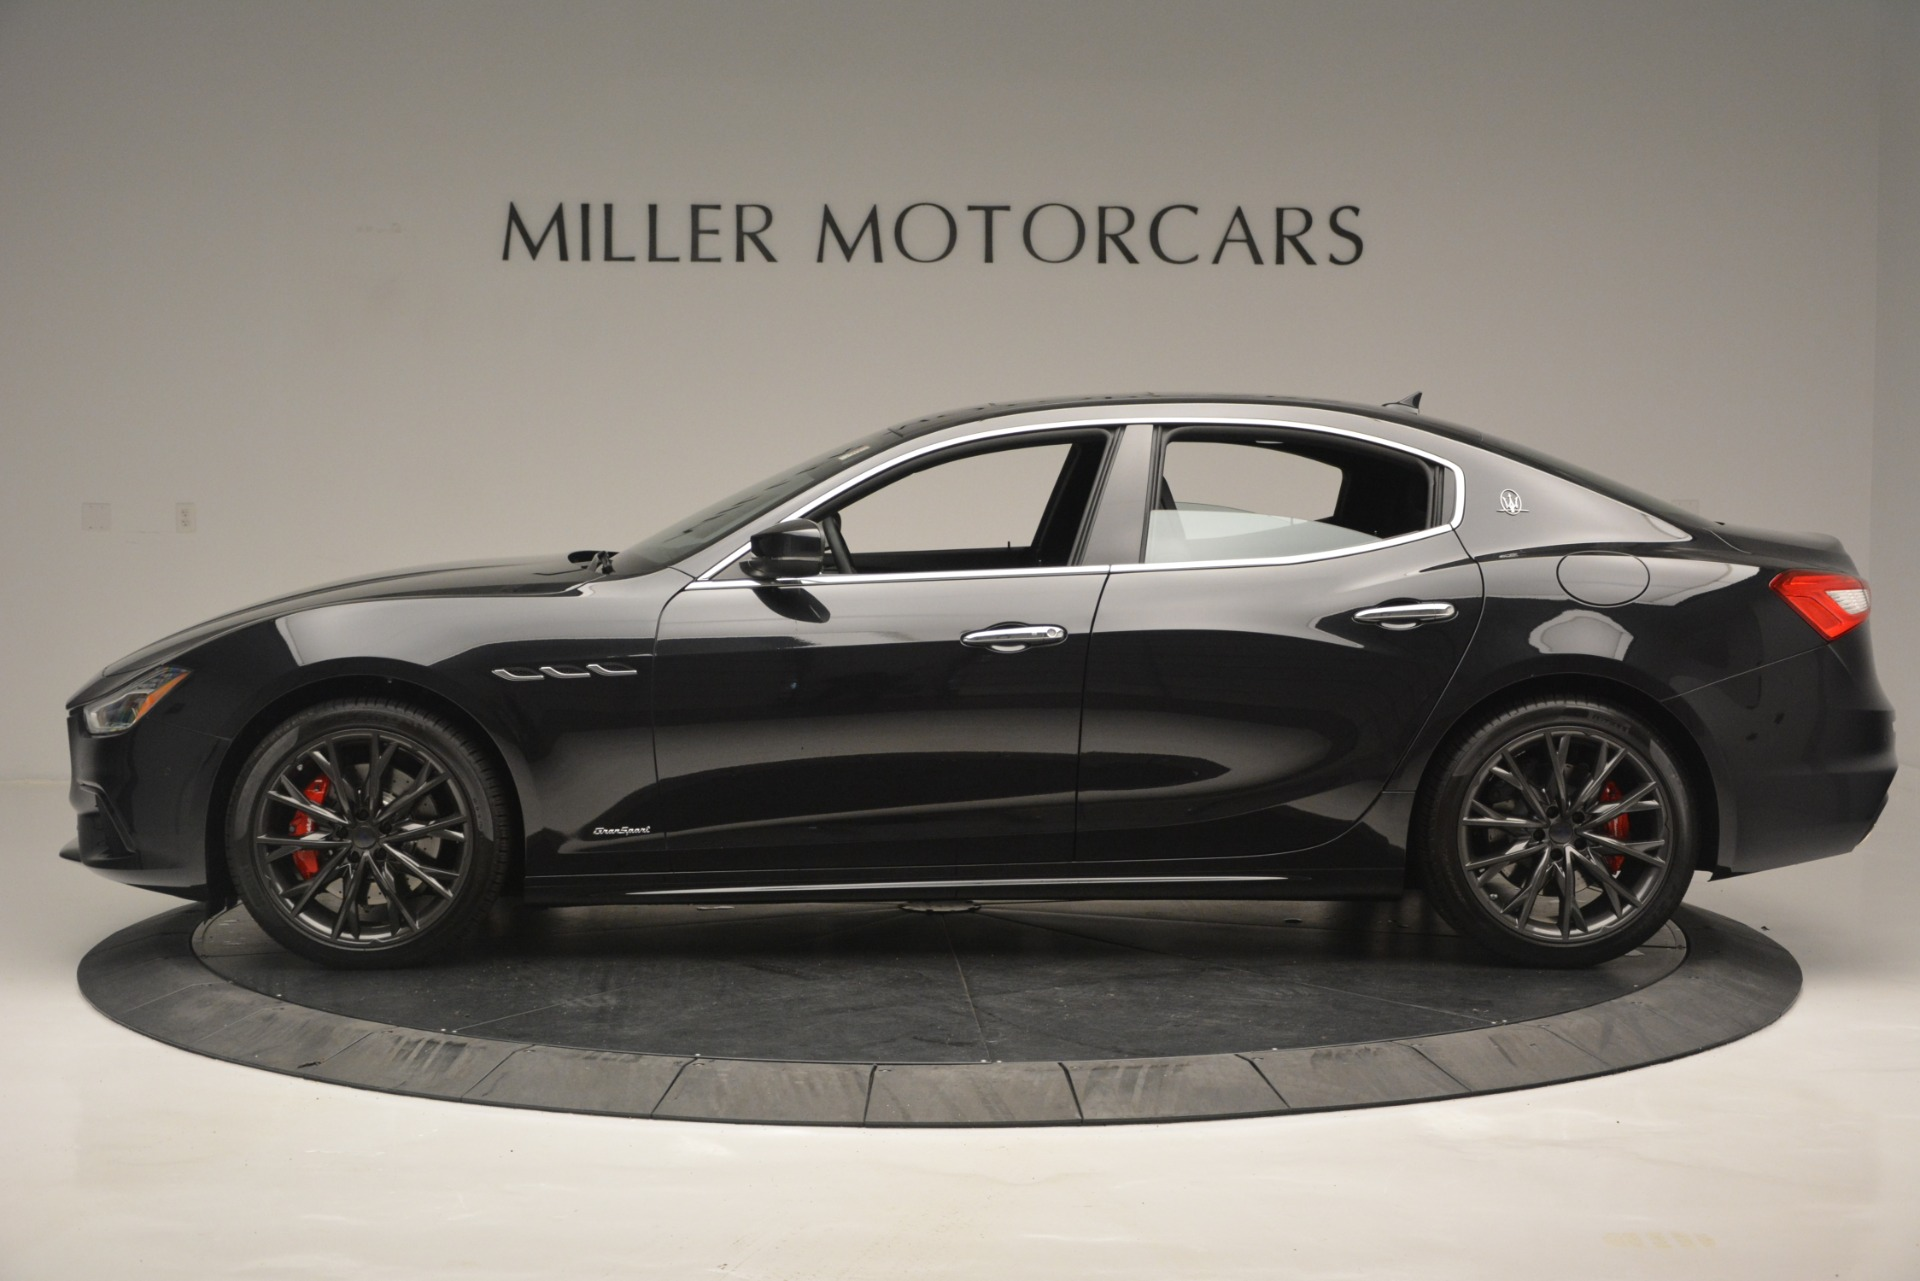 New 2019 Maserati Ghibli S Q4 GranSport For Sale In Westport, CT 2588_p3